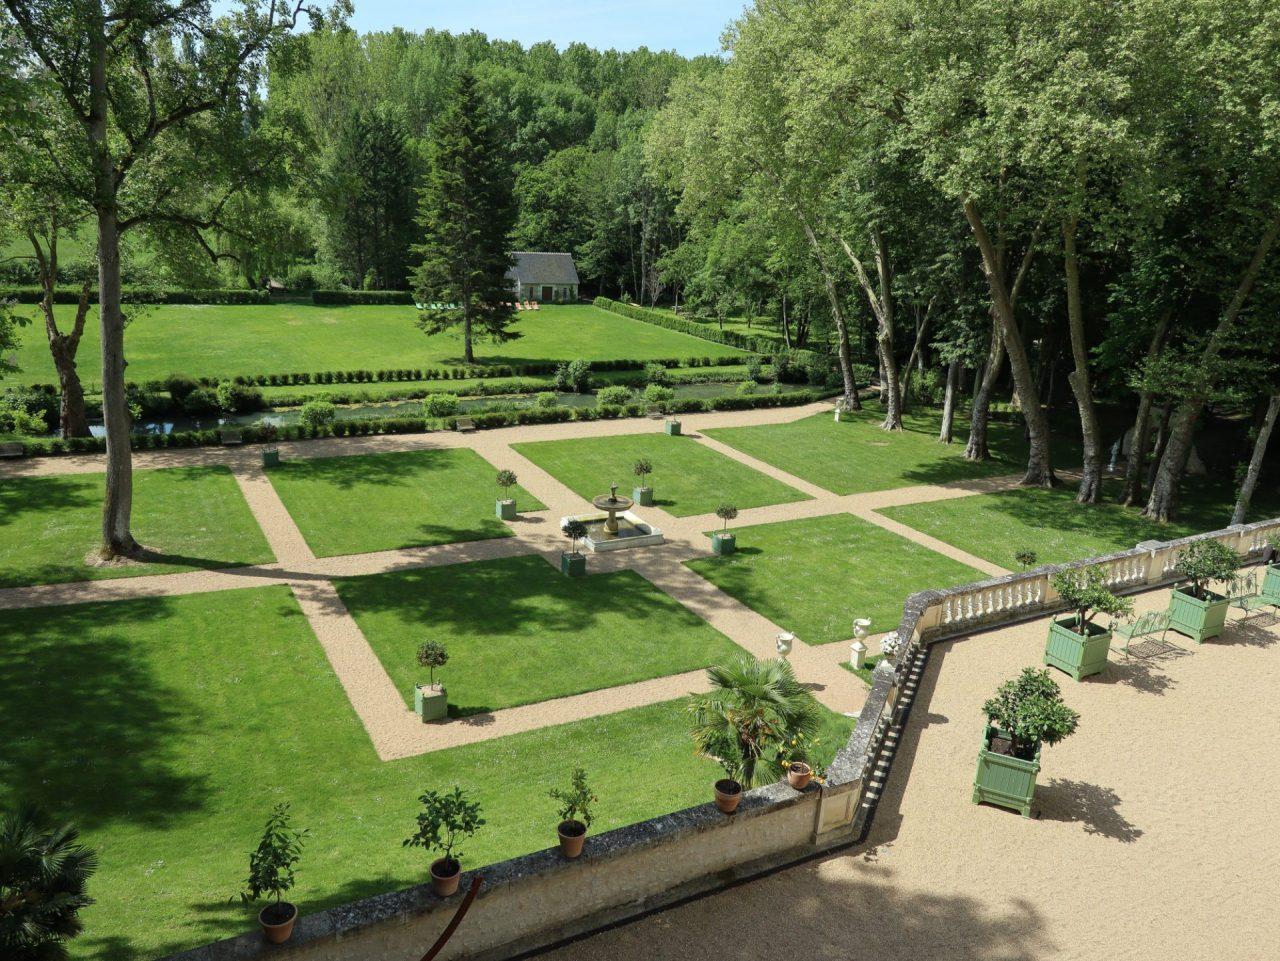 val-de-loire-amboise-jardin-de-chateau-gaillard